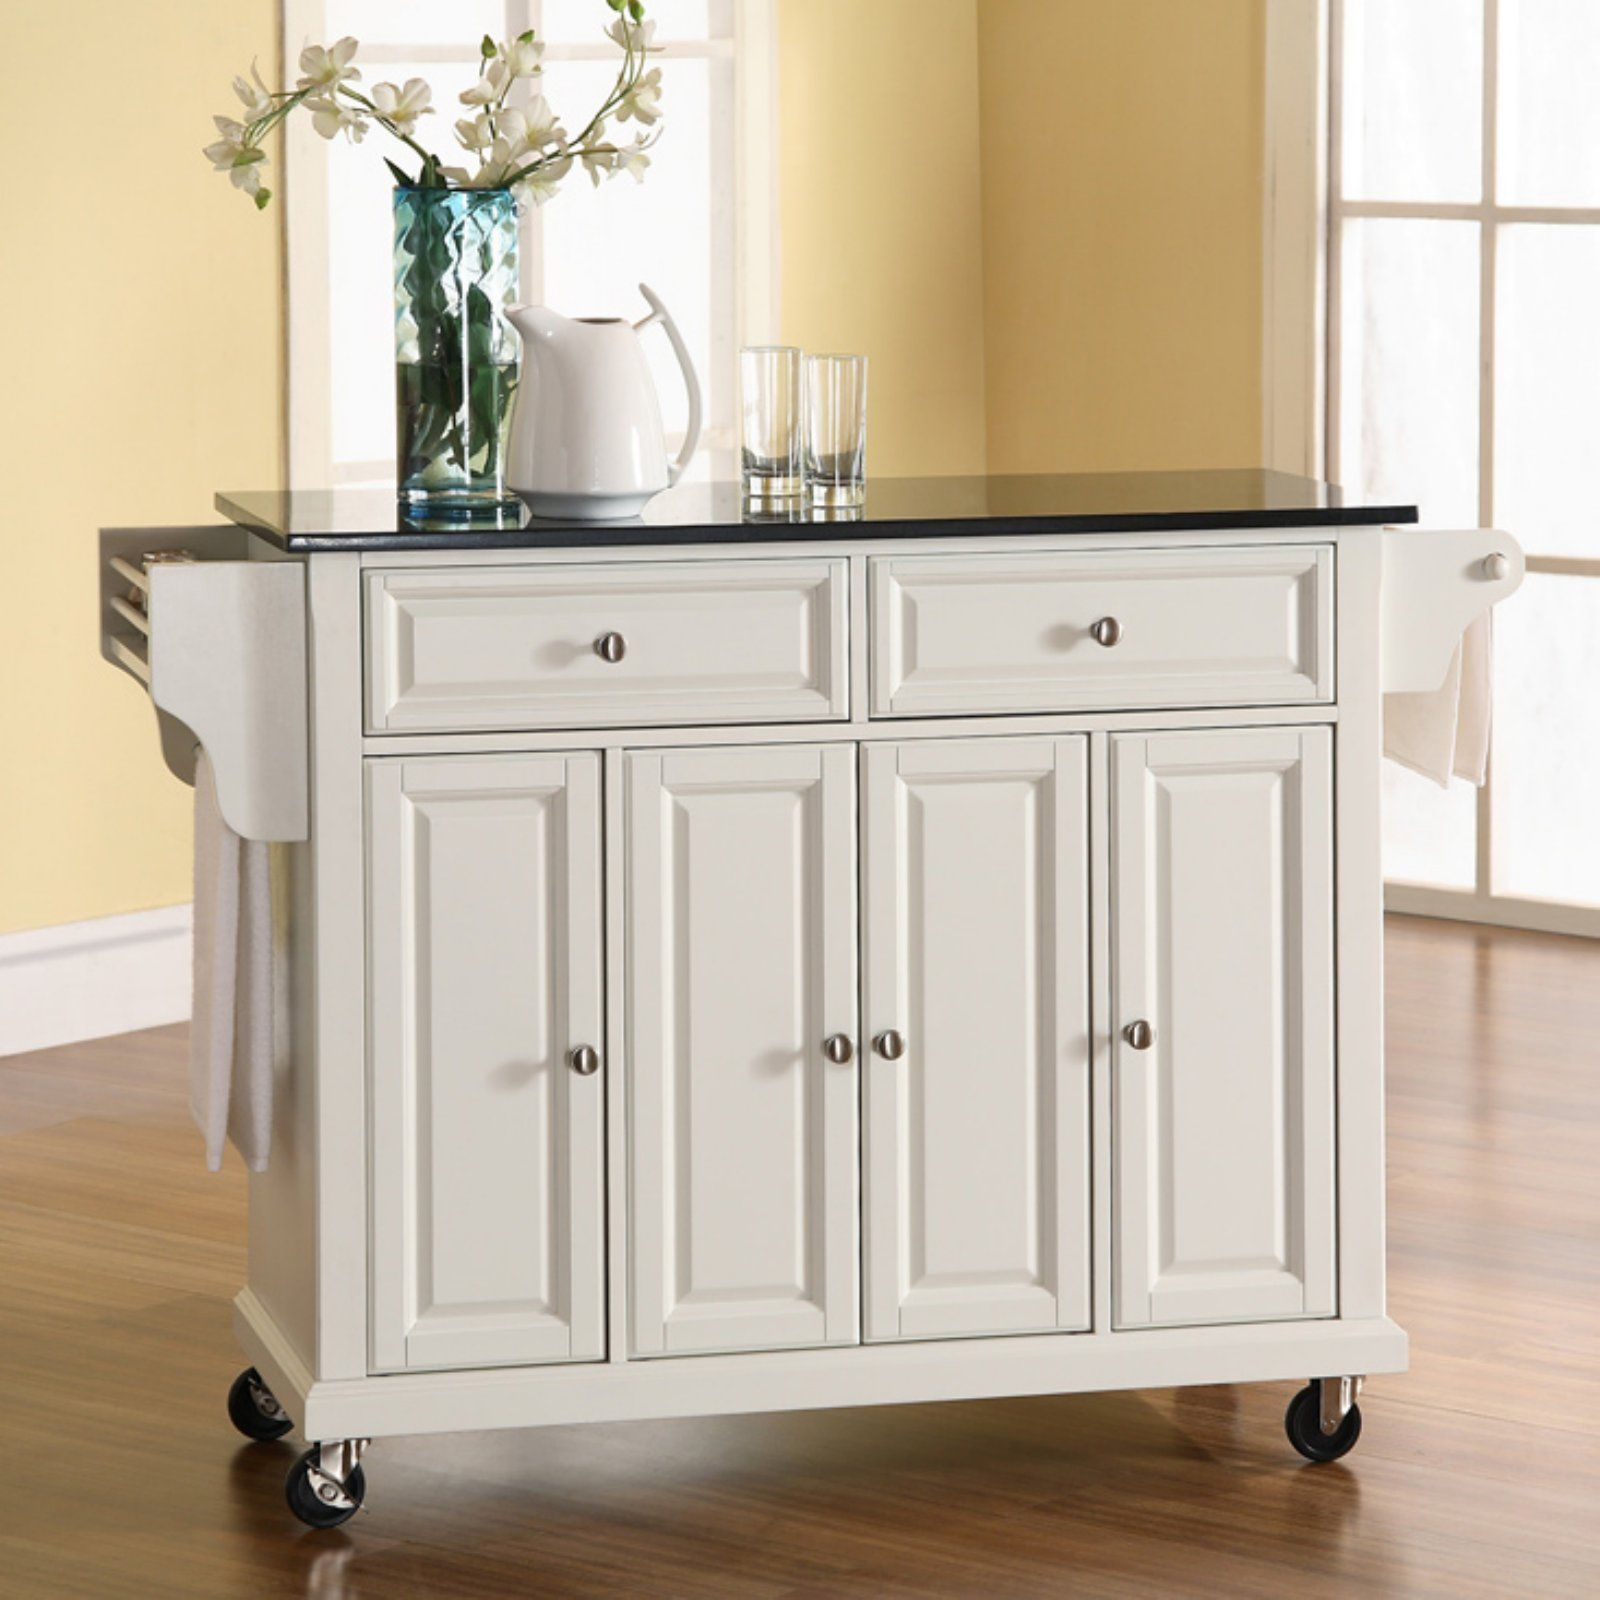 Sensational Crosley Newport Granite Top Kitchen Cart Island Portable Download Free Architecture Designs Scobabritishbridgeorg